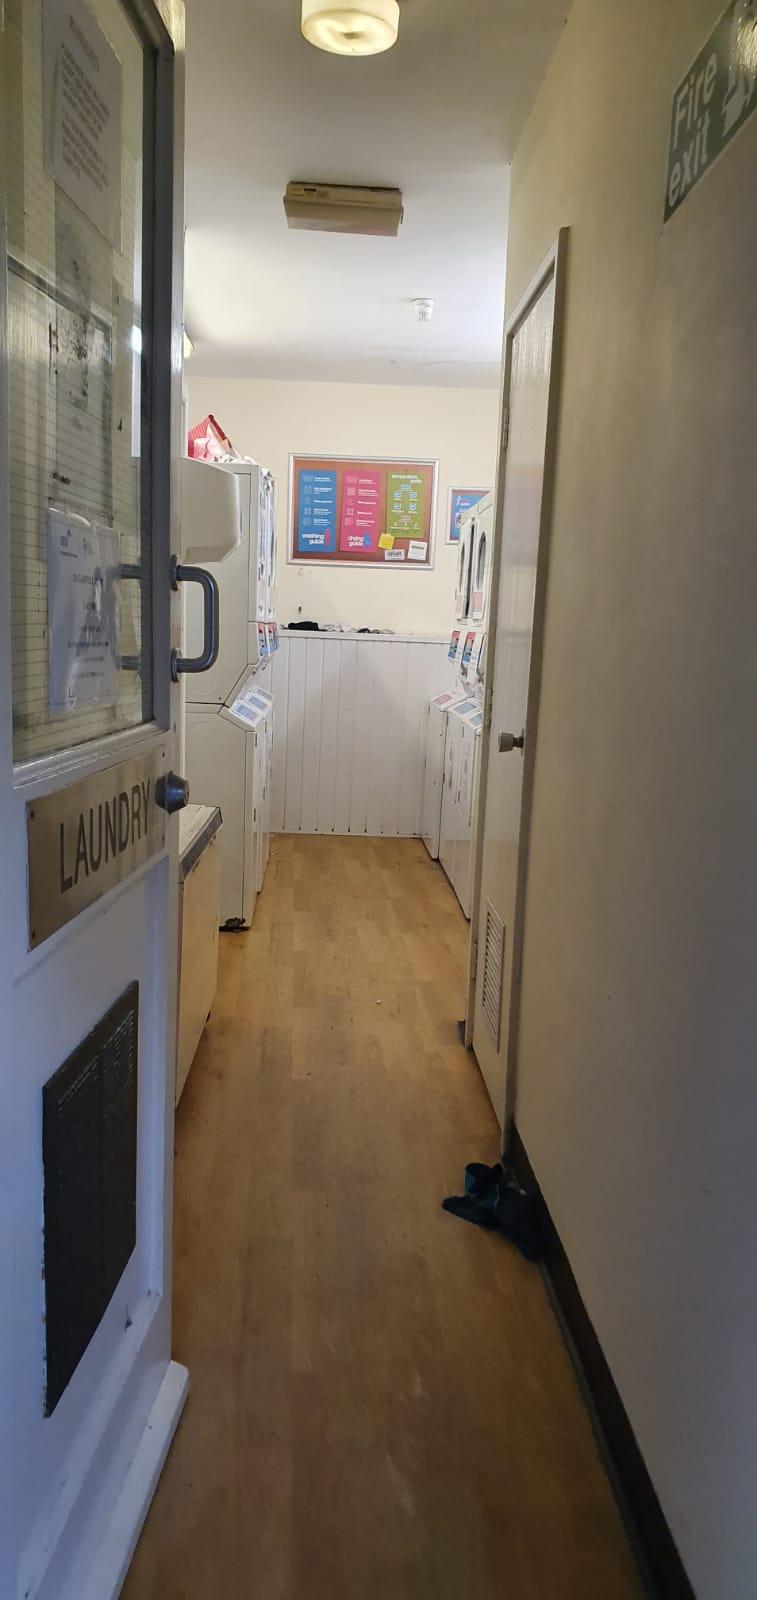 Sugarwell laundry room